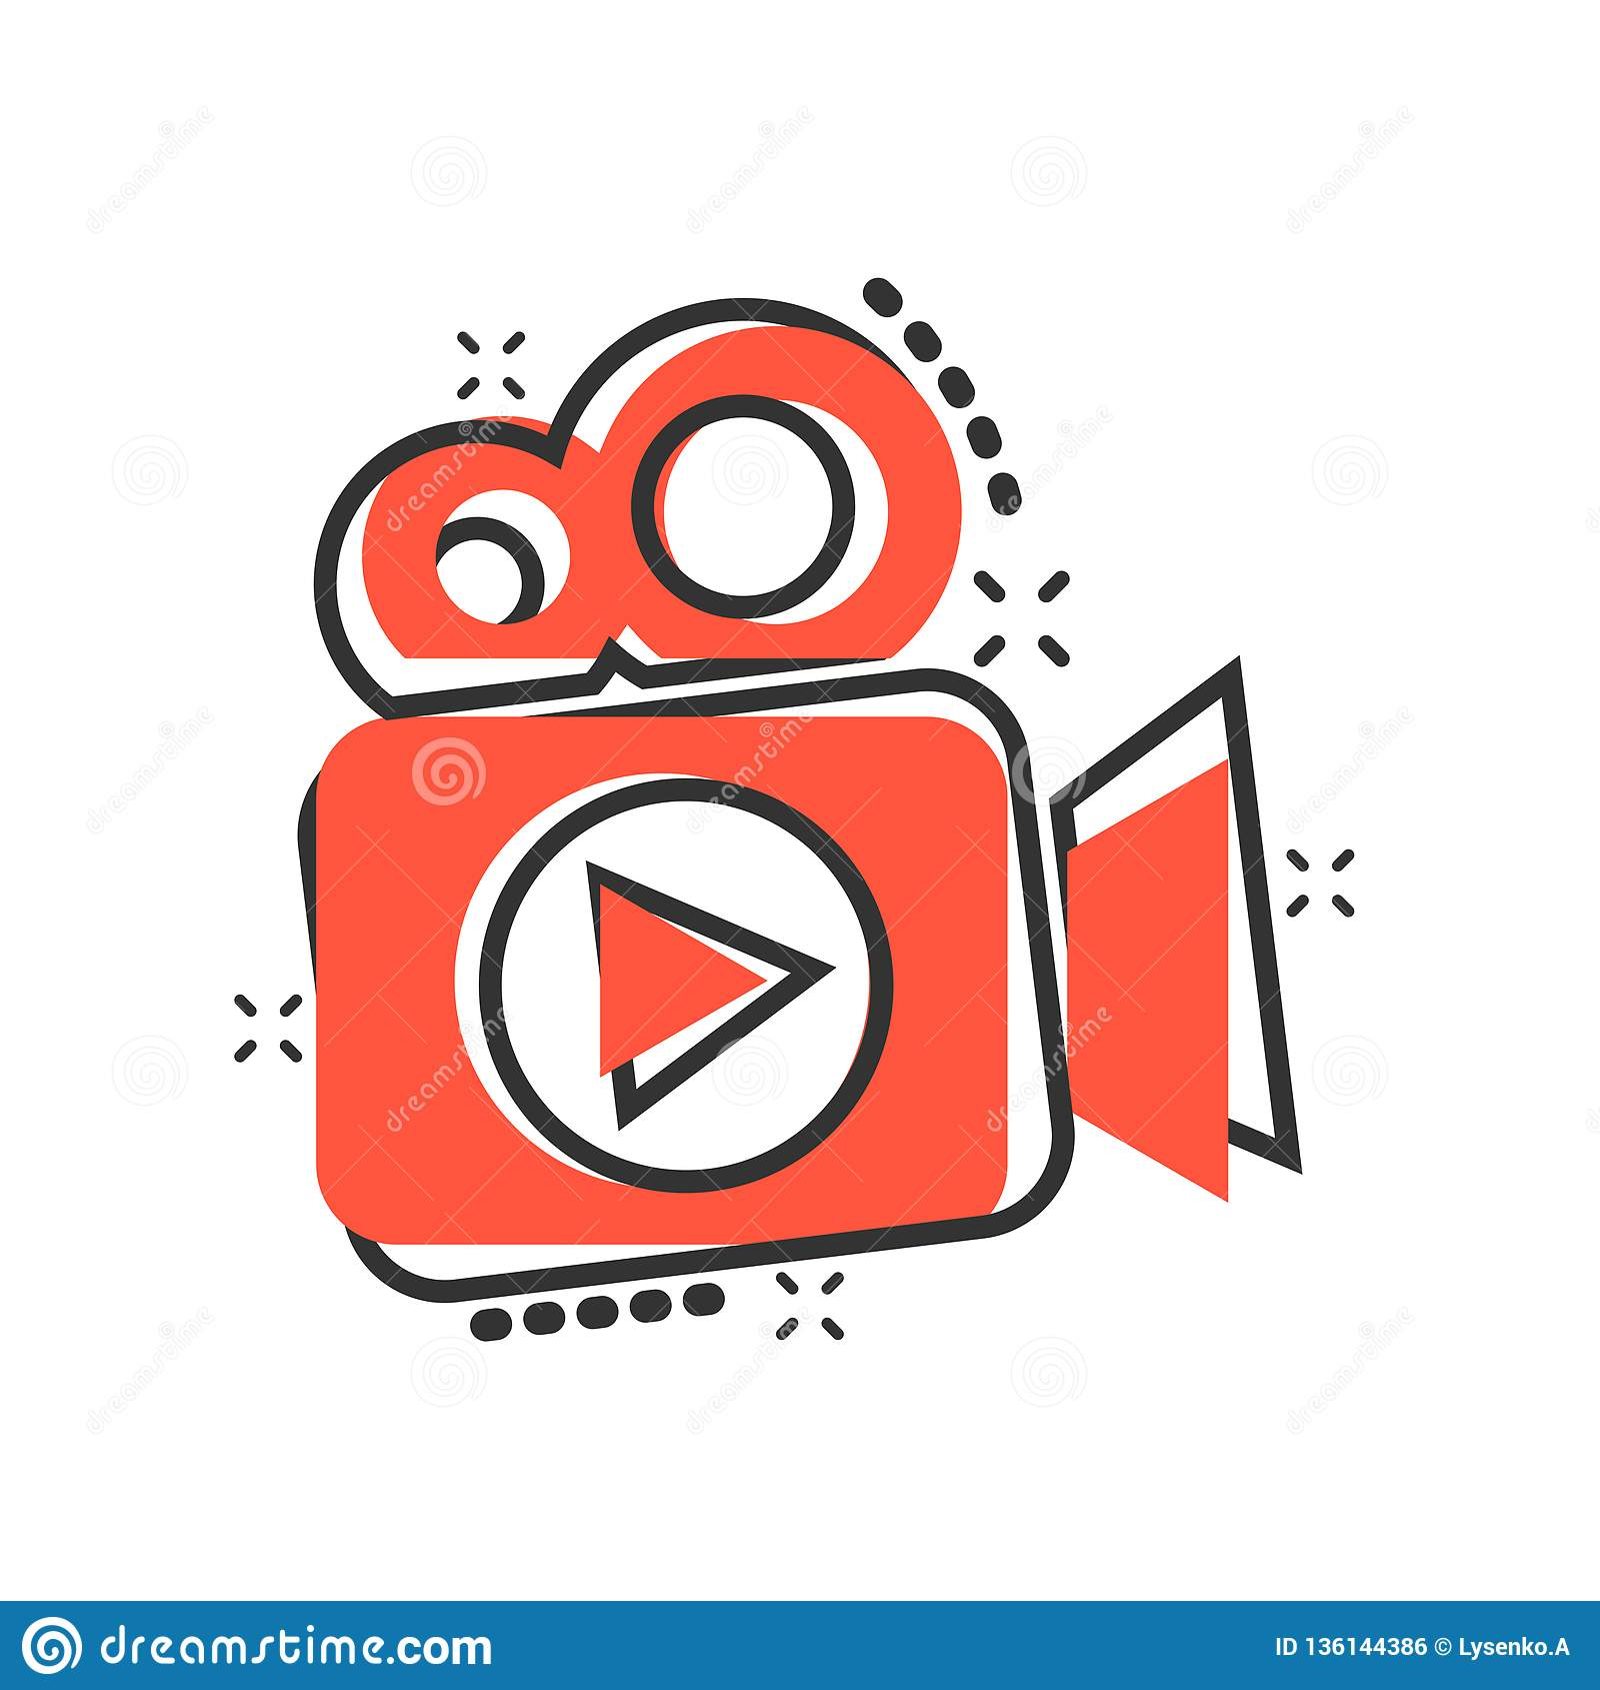 Video Cartoon Stock Illustrations 46 830 Video Cartoon Stock Illustrations Vectors Clipart Dreamstime